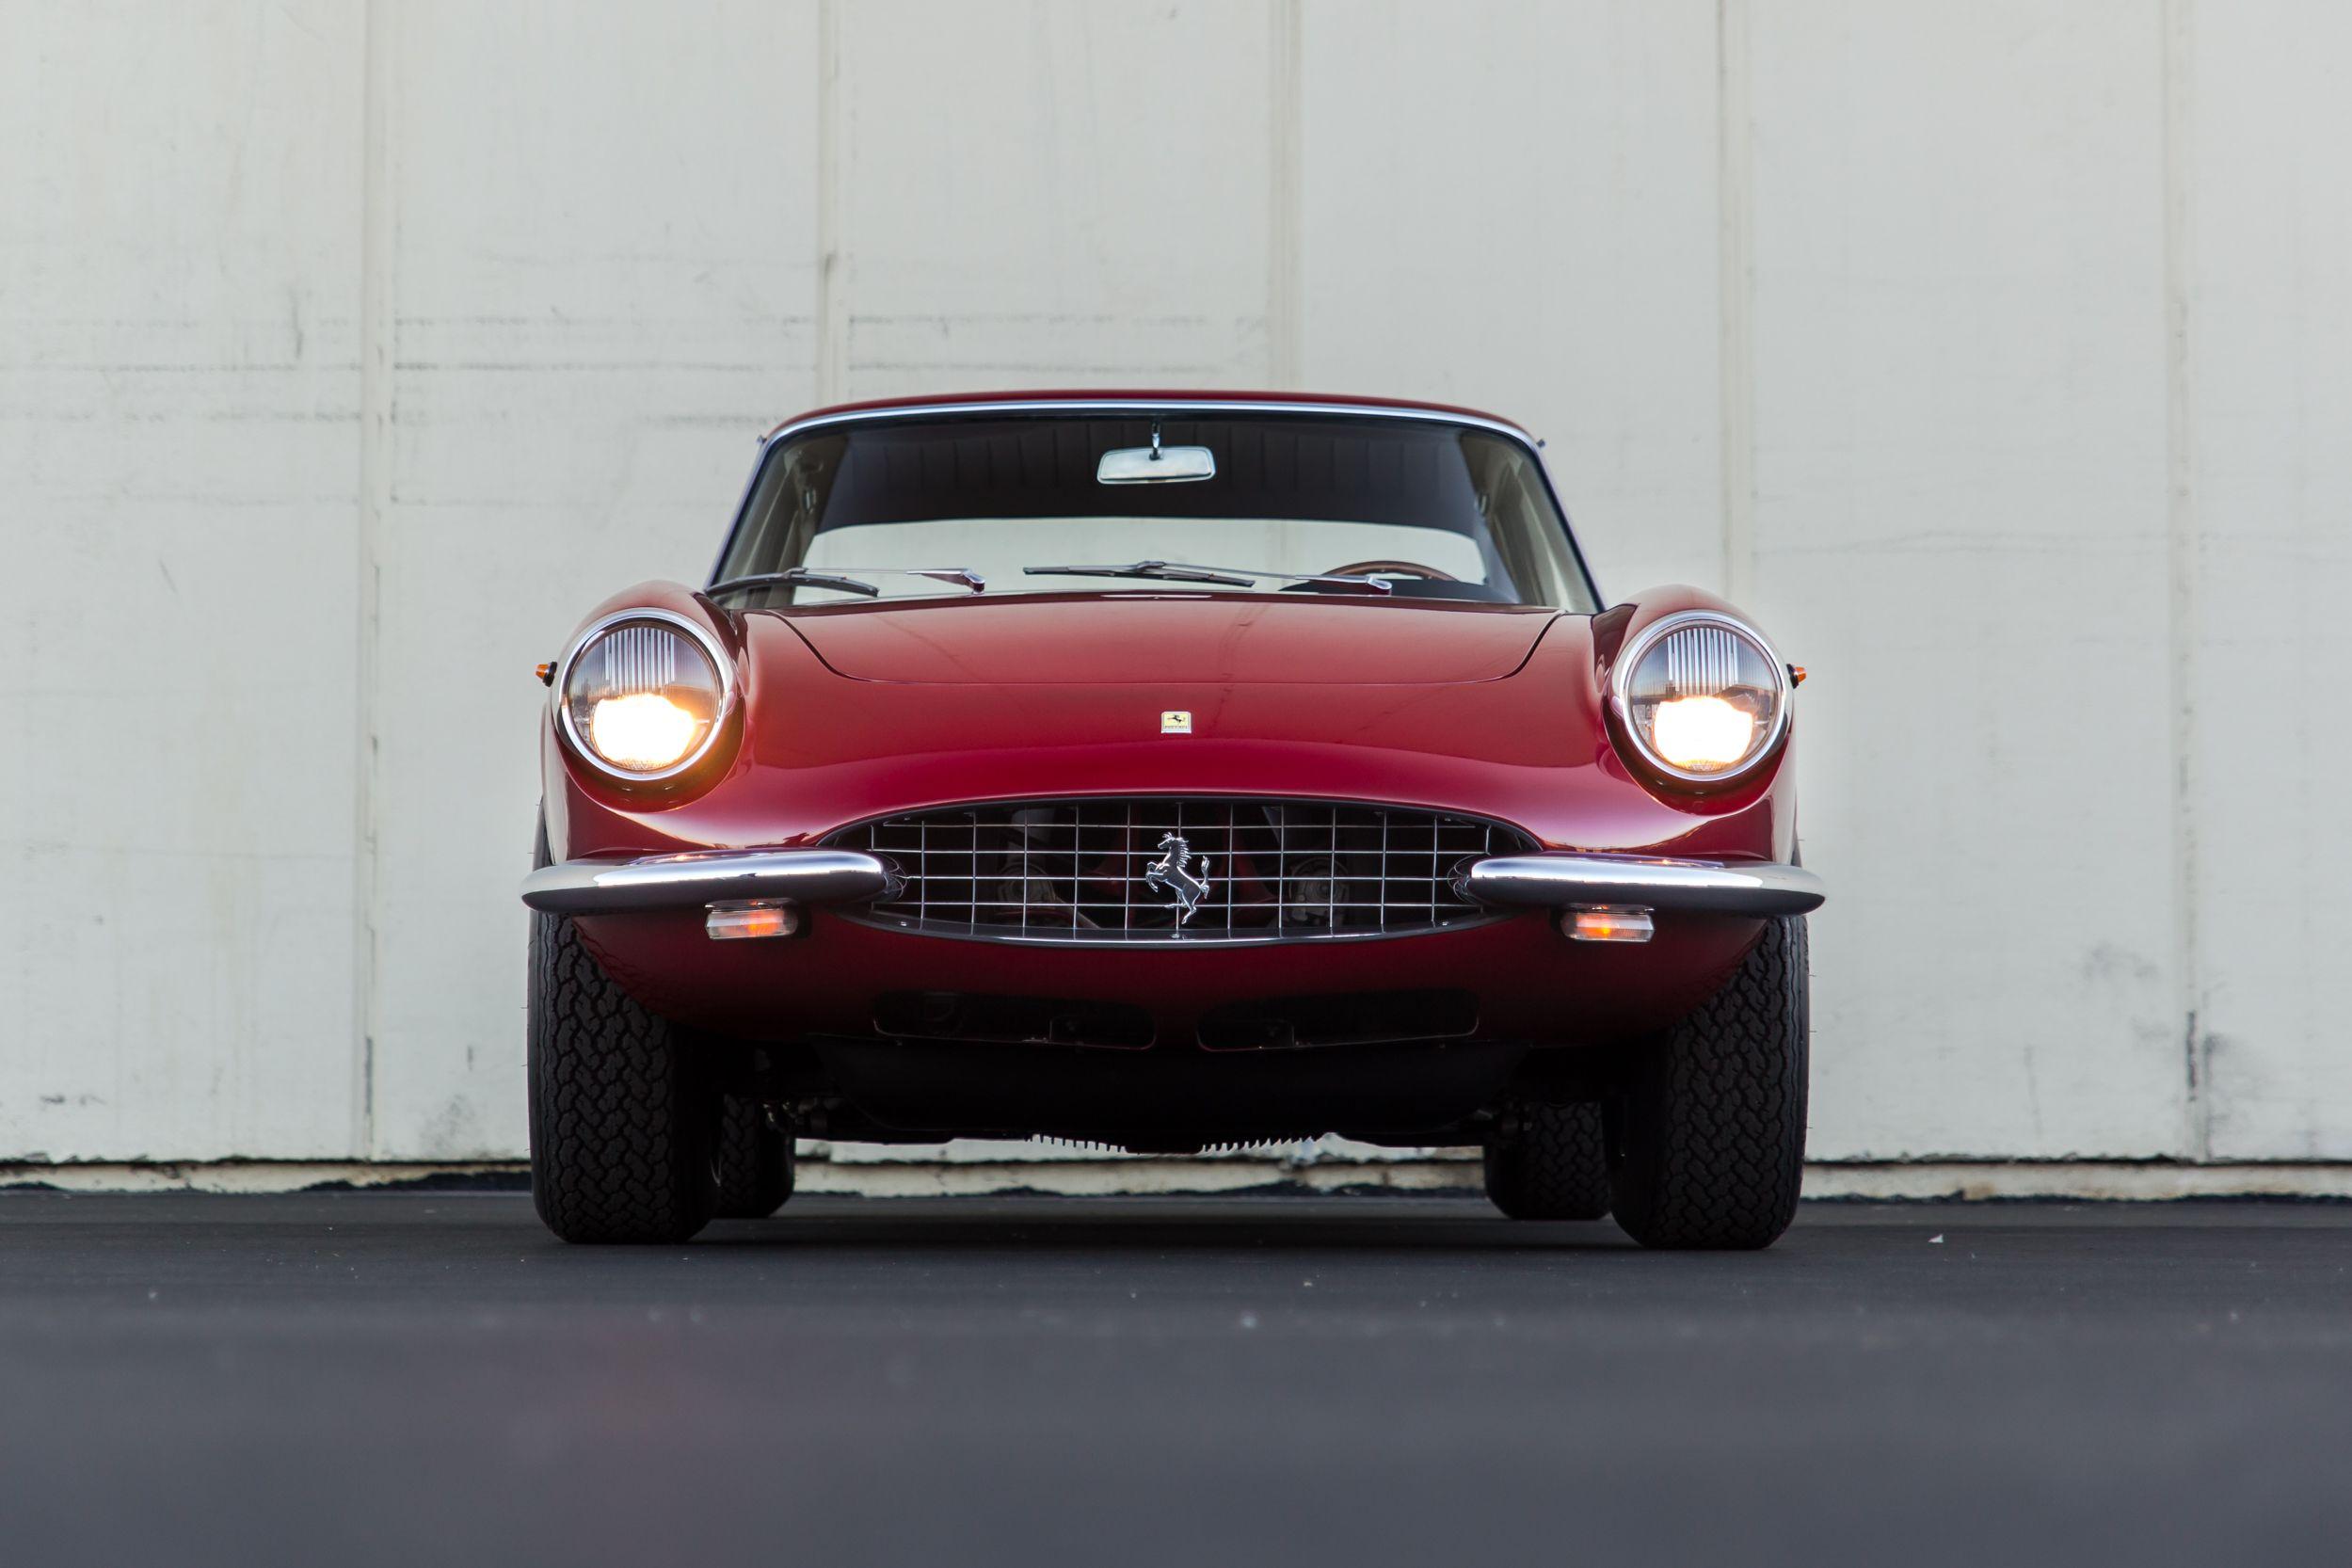 1967 Ferrari 330 Gtc Ferrari Car Guys Automobile Industry